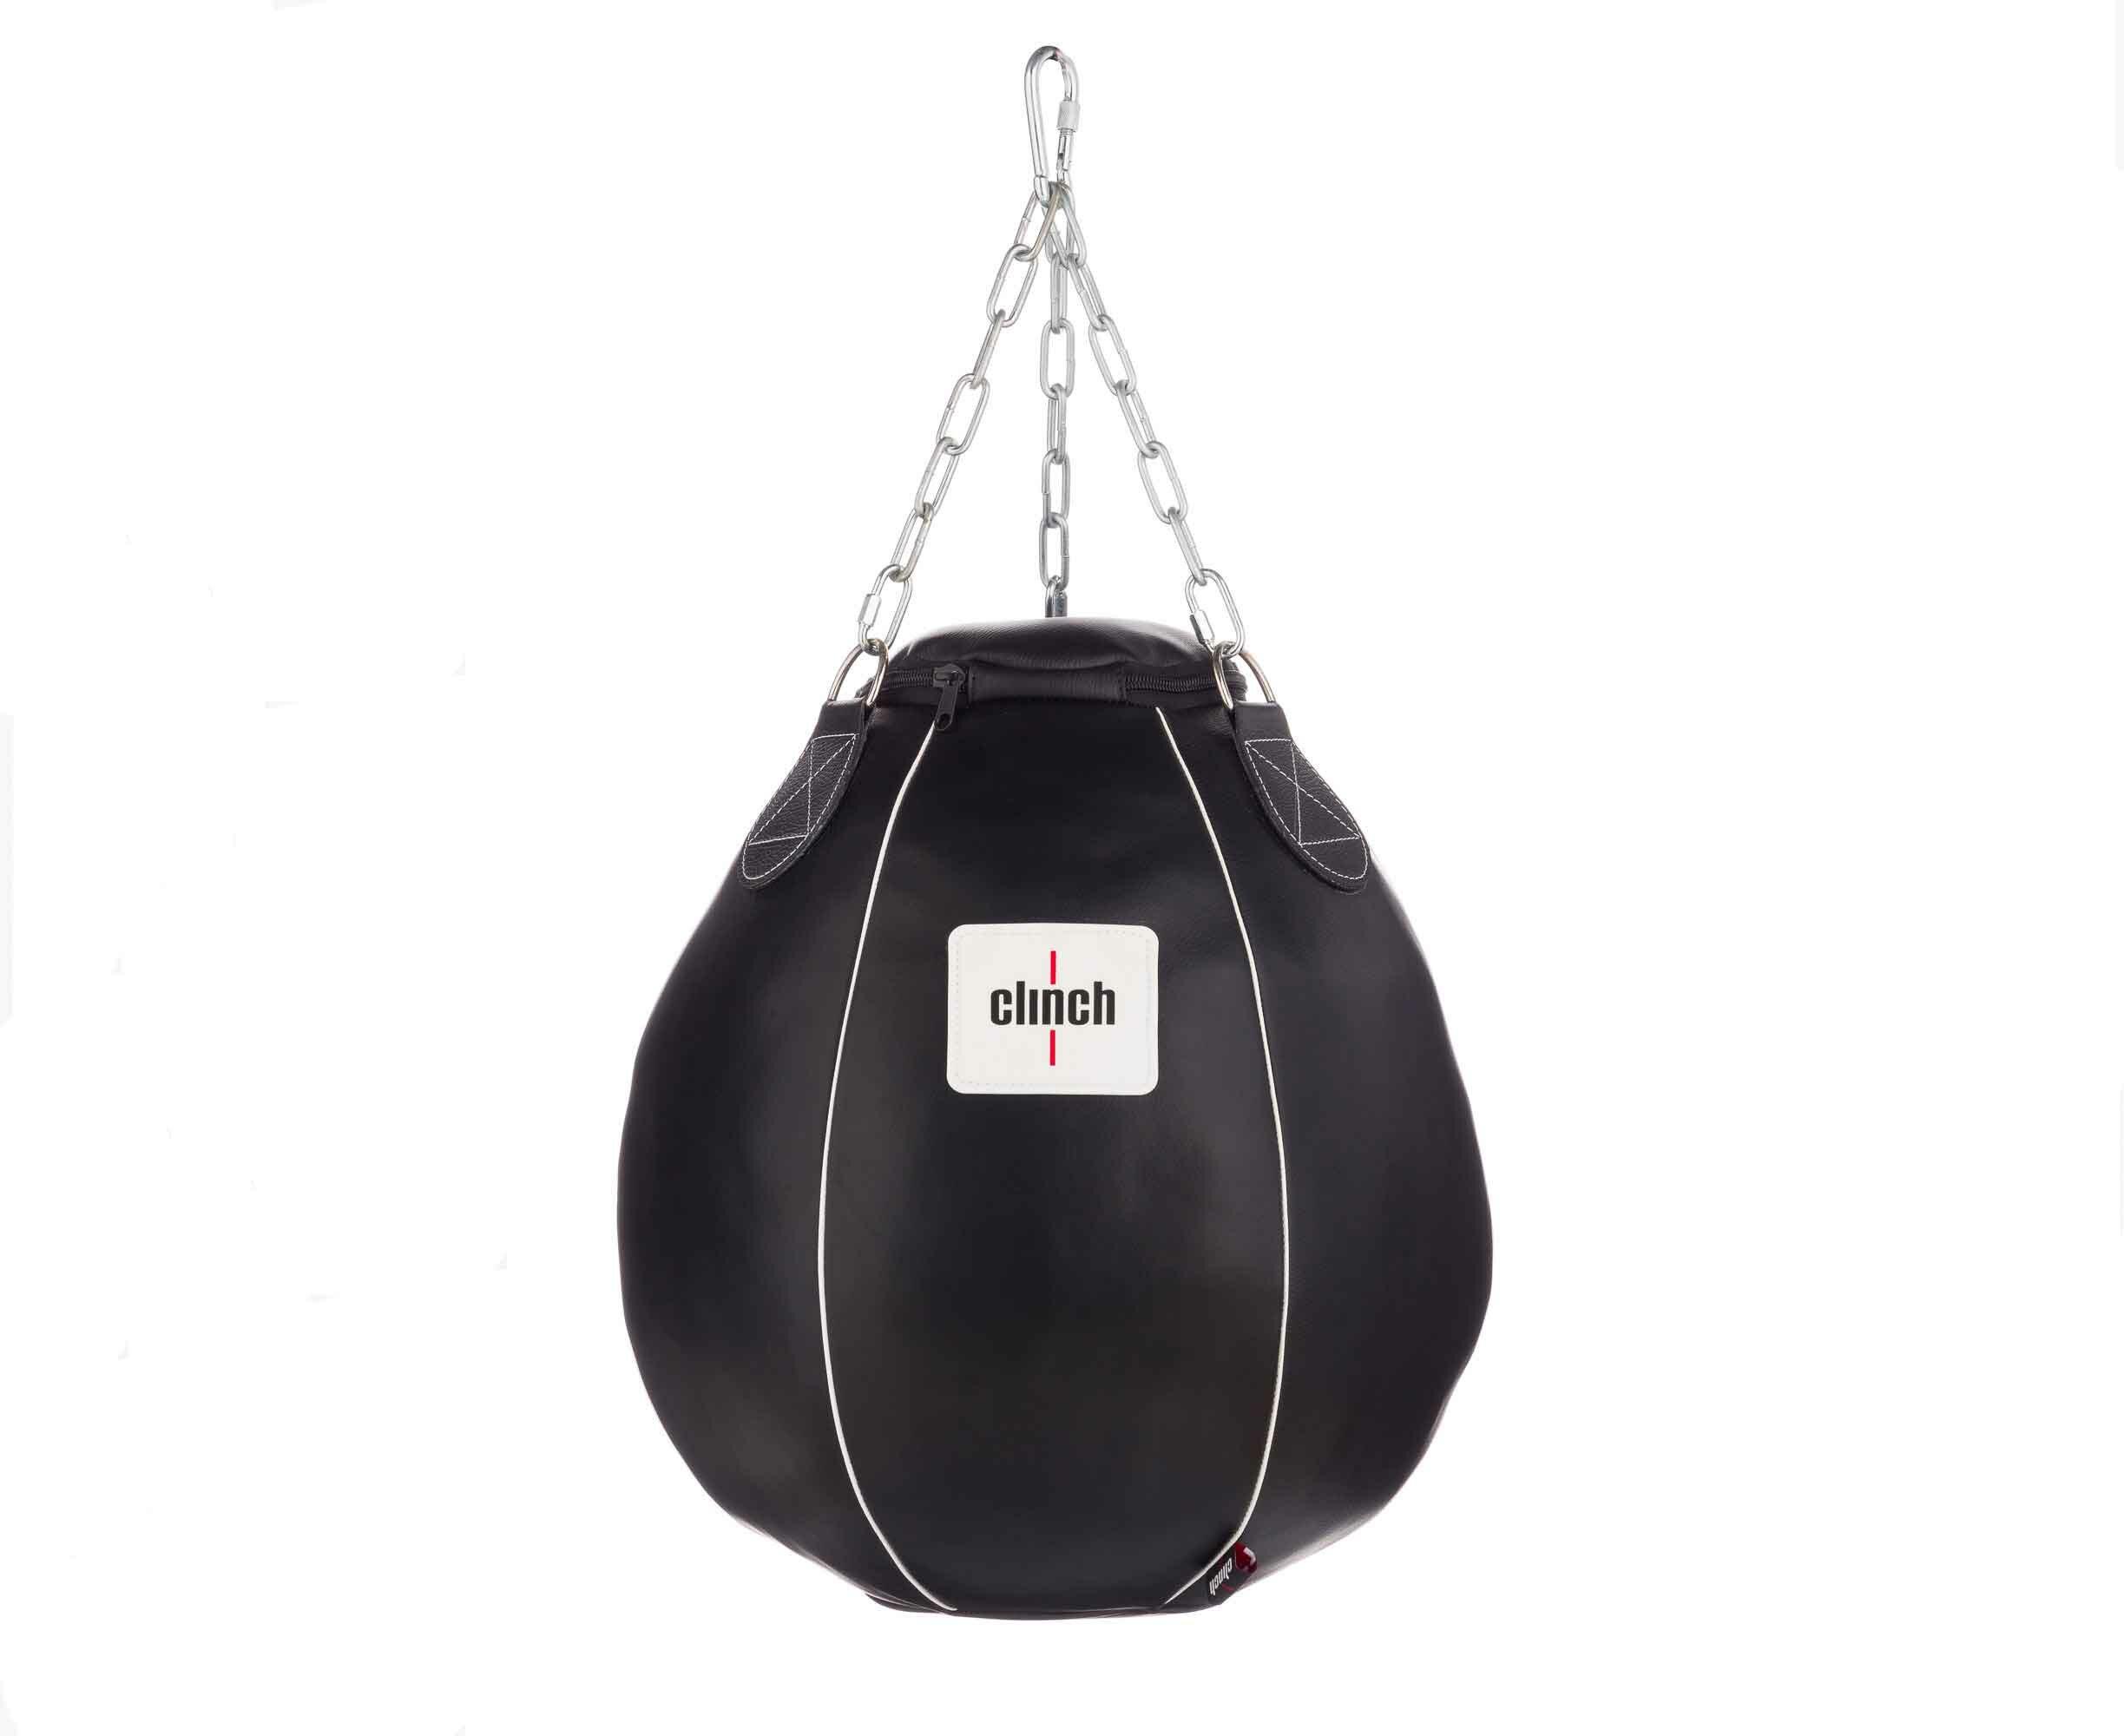 Груша боксерская Clinch Profi & Durable 60x50 см черная (размер 60х50 см)